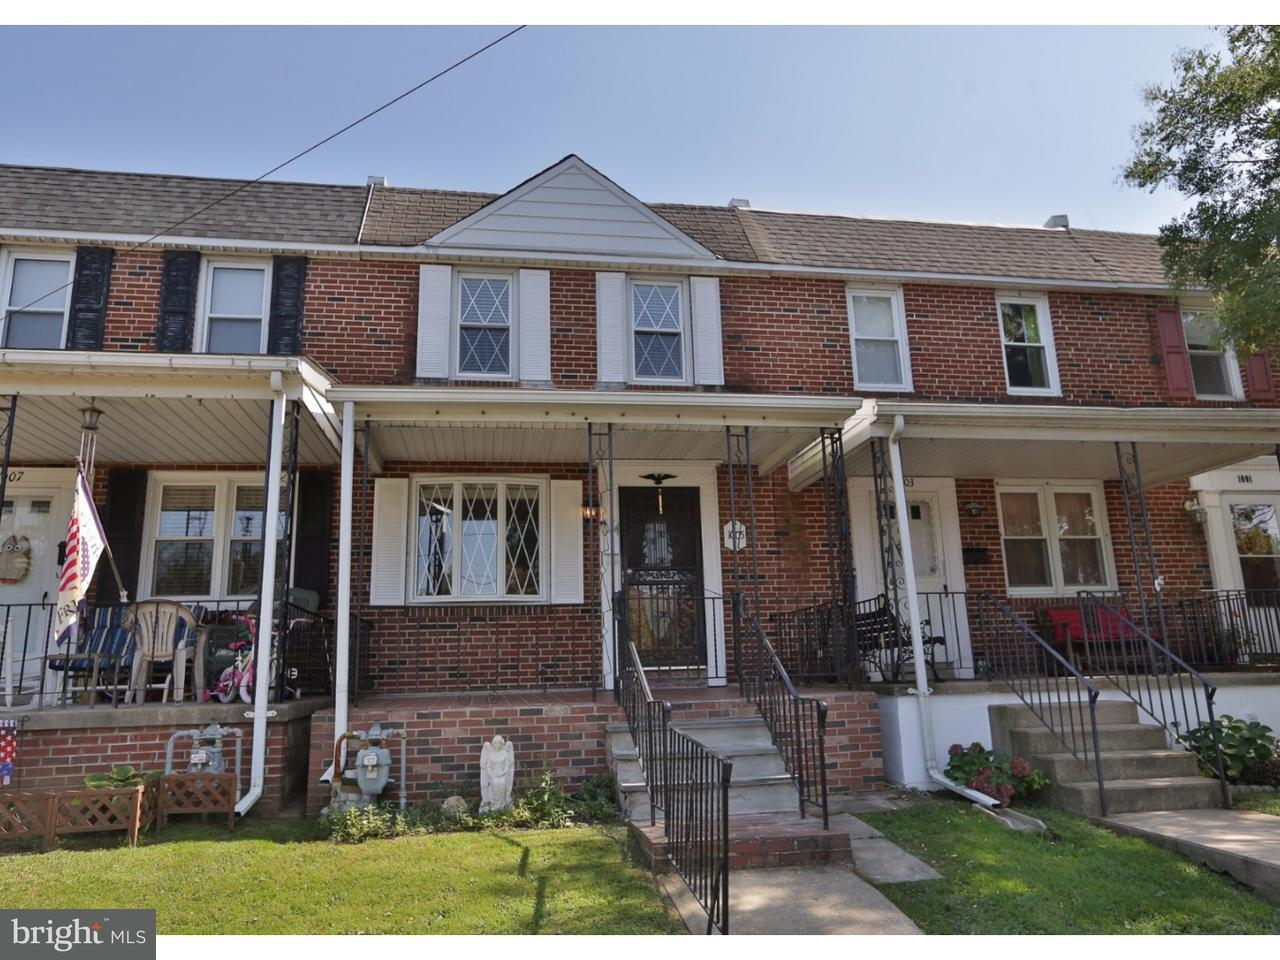 Townhouse for Sale at 1005 MAPLE Street Conshohocken, Pennsylvania 19428 United States